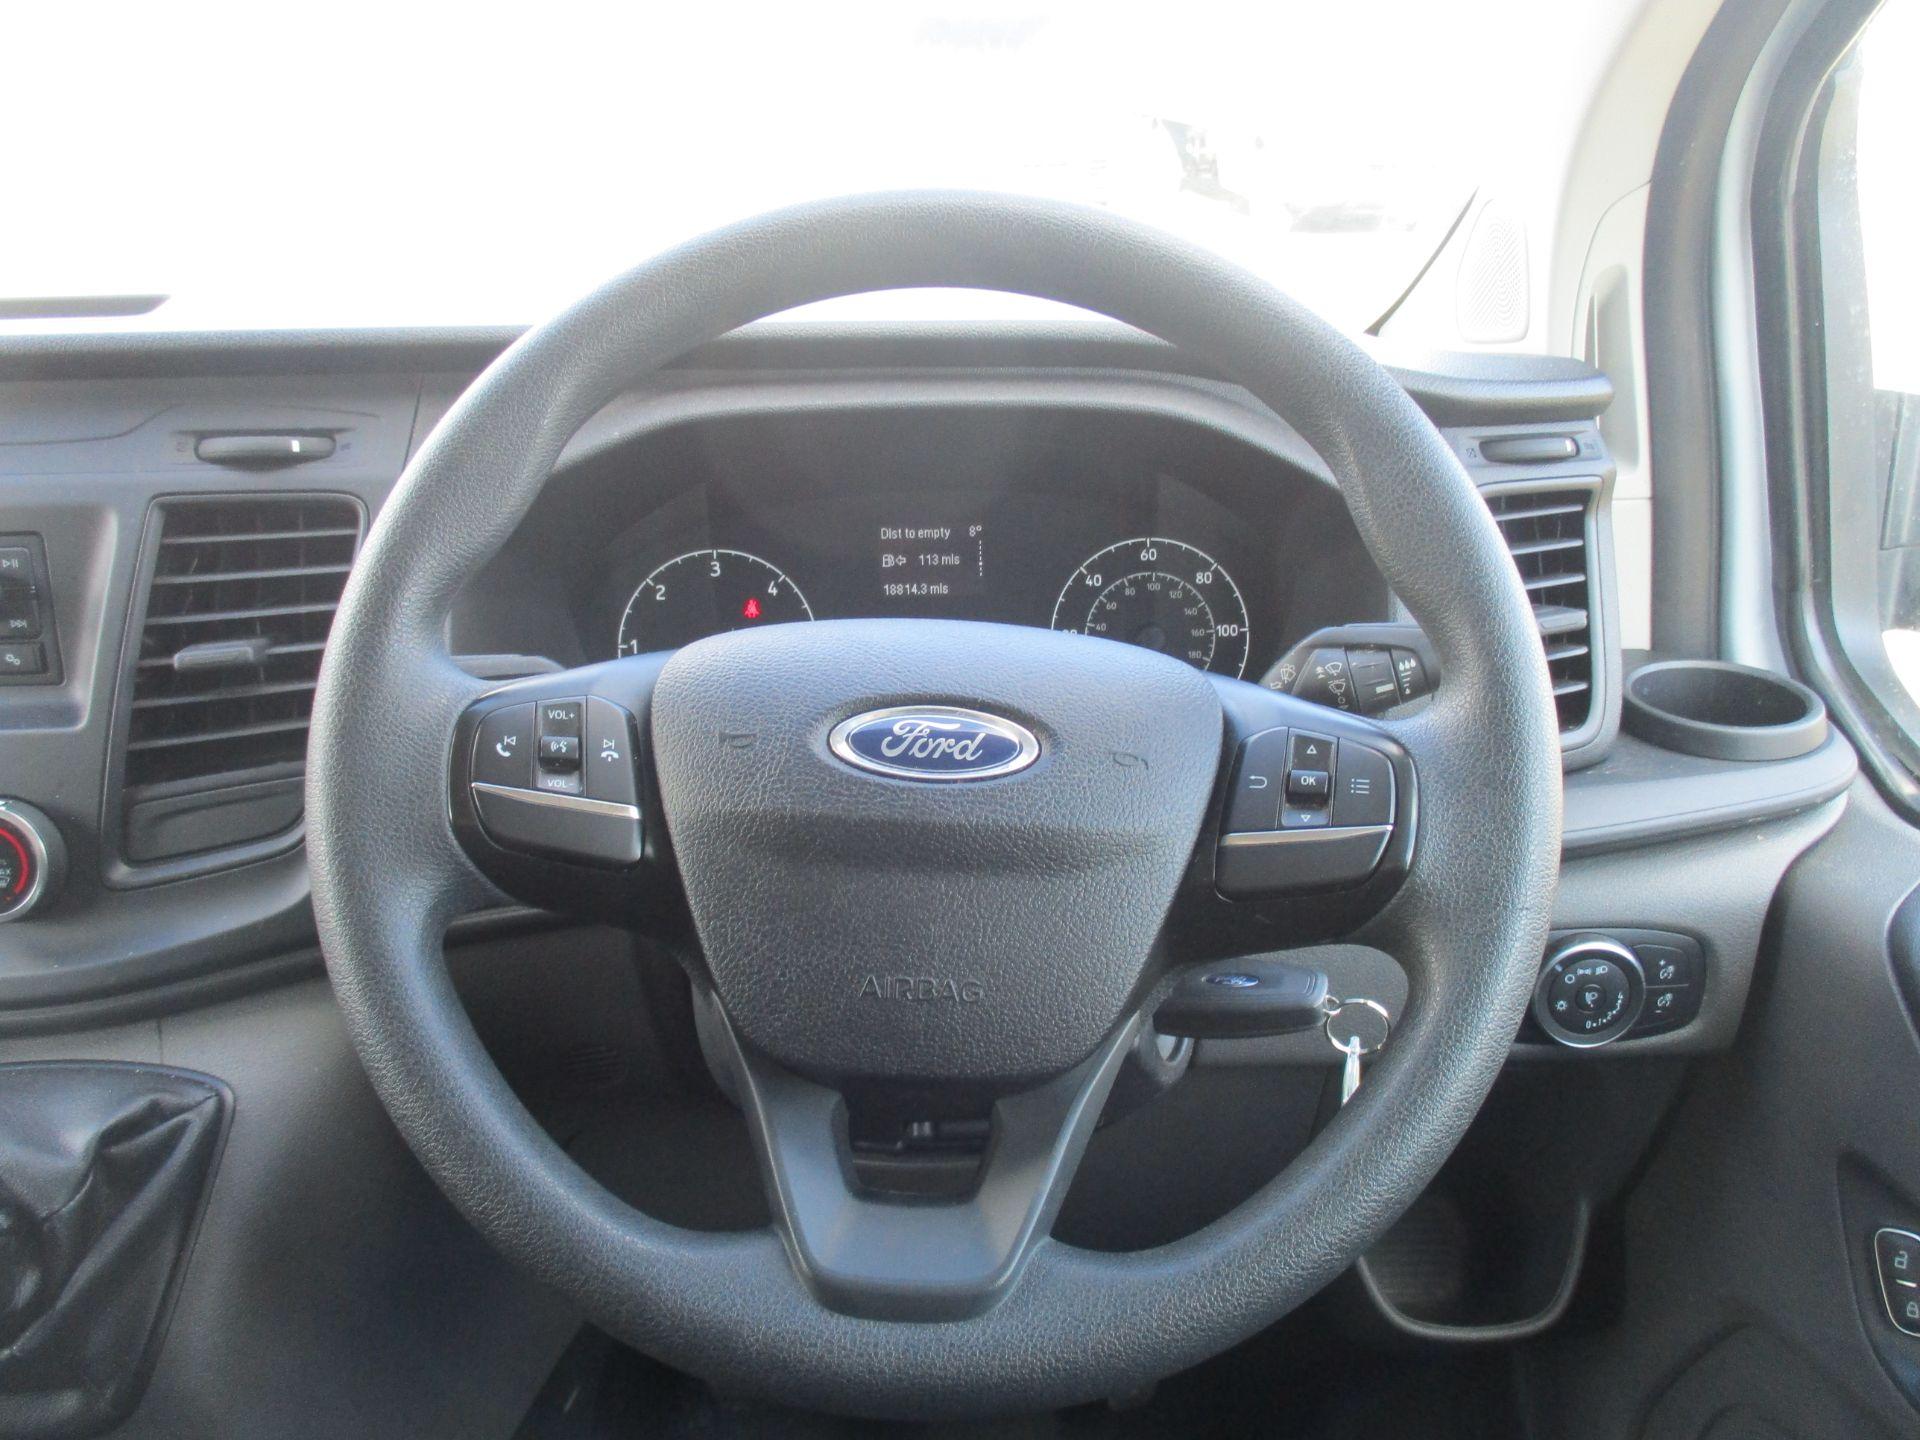 2018 Ford Transit Custom 300 L1 DIESEL FWD 2.0 TDCI 105PS LOW ROOF VAN EURO 6 (FL68AHN) Image 16